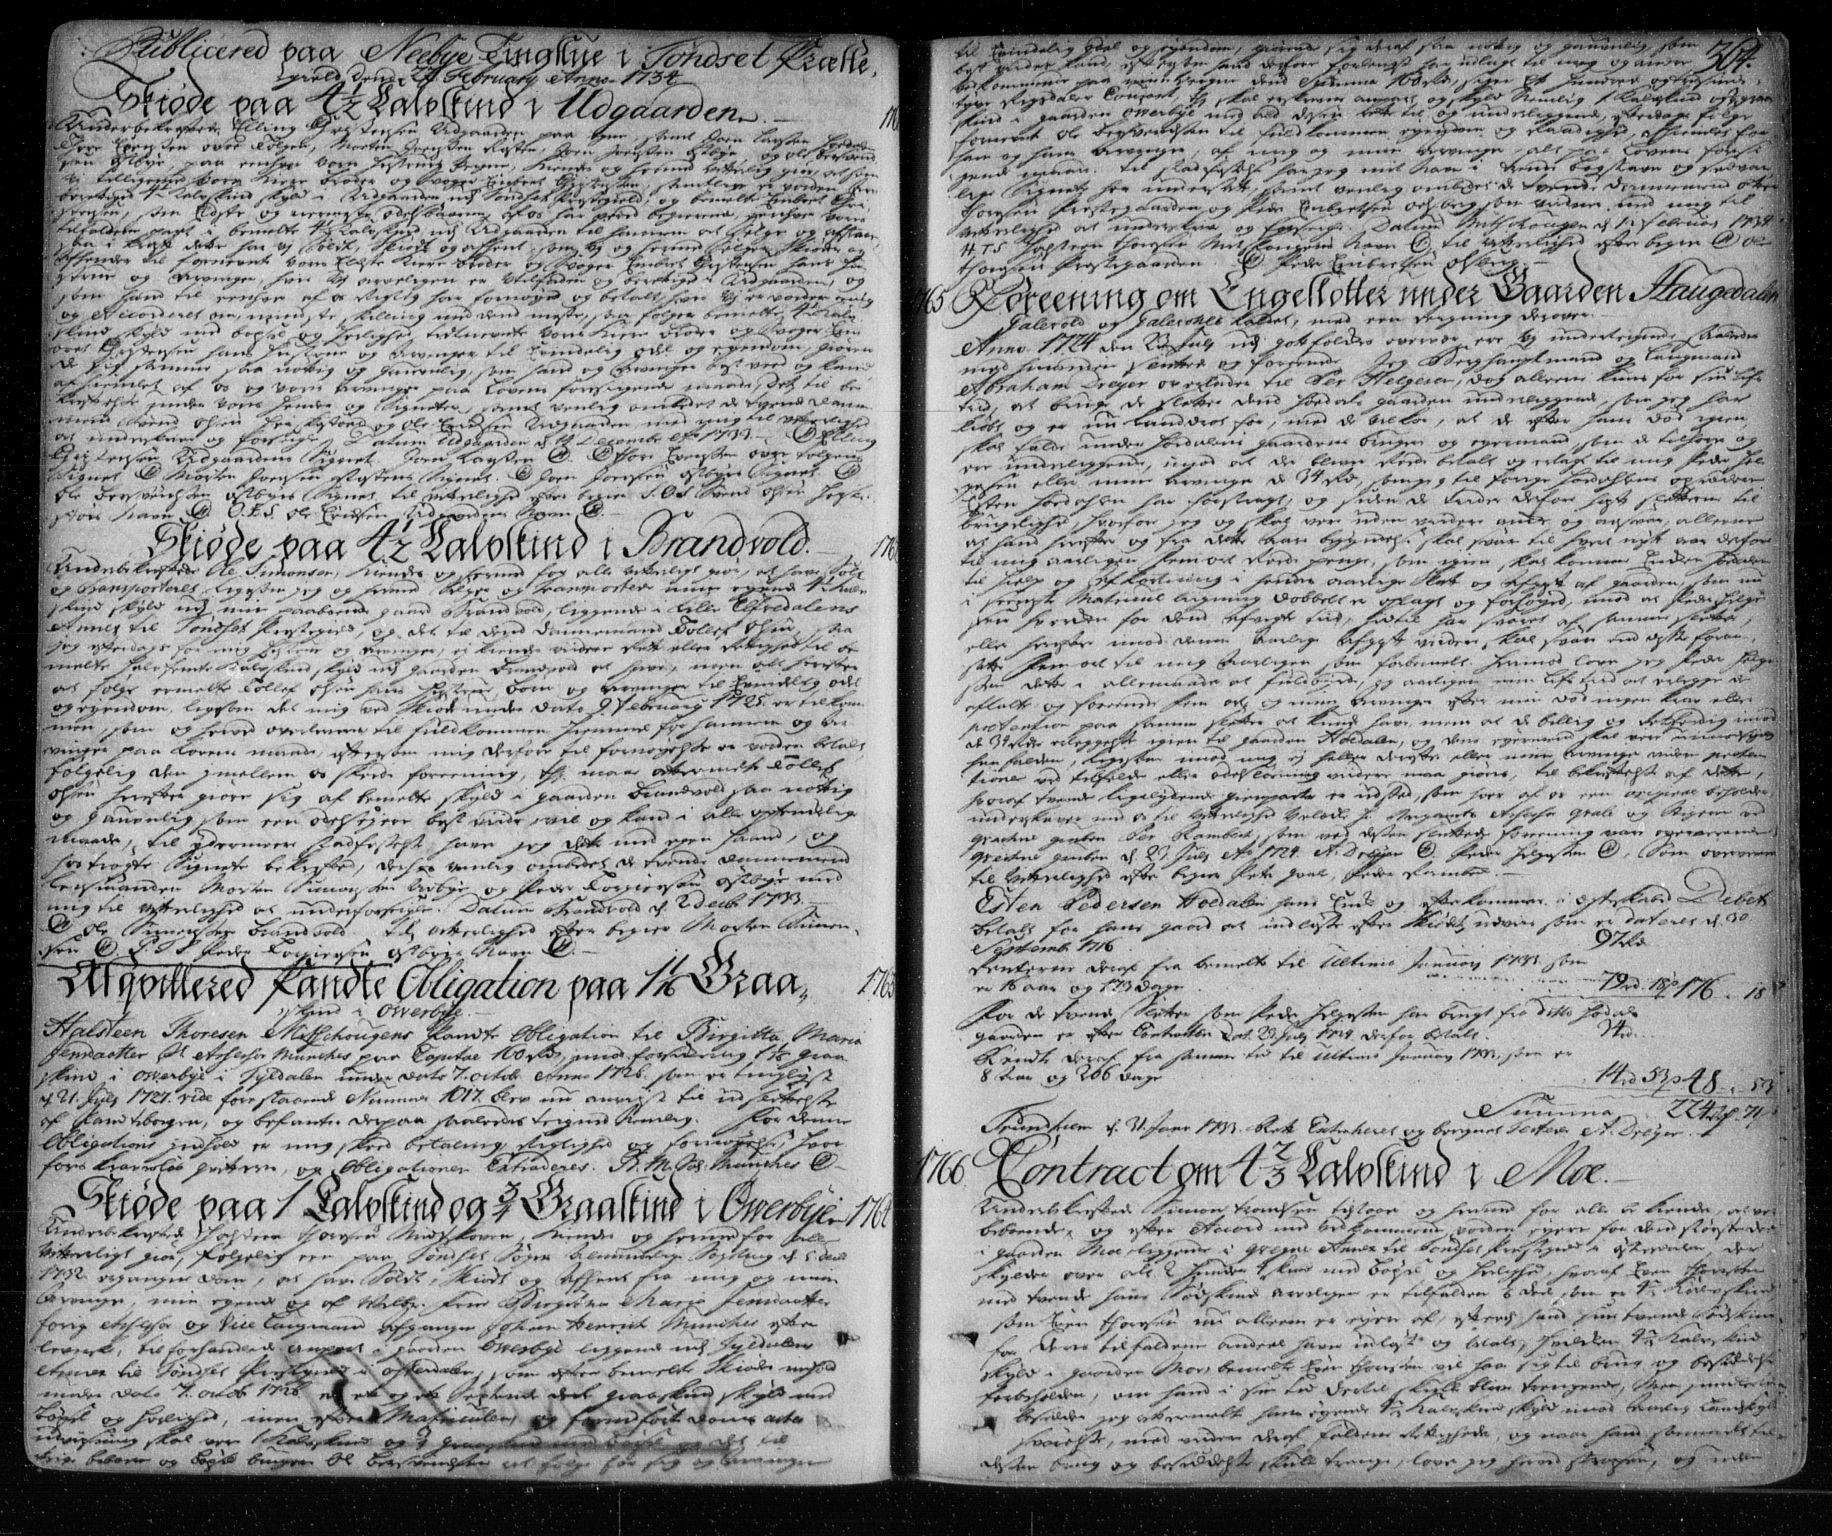 SAH, Solør og Østerdalen sorenskriveri, H/Hb/Hba/L0002: Pantebok nr. 2, 1716-1736, s. 364